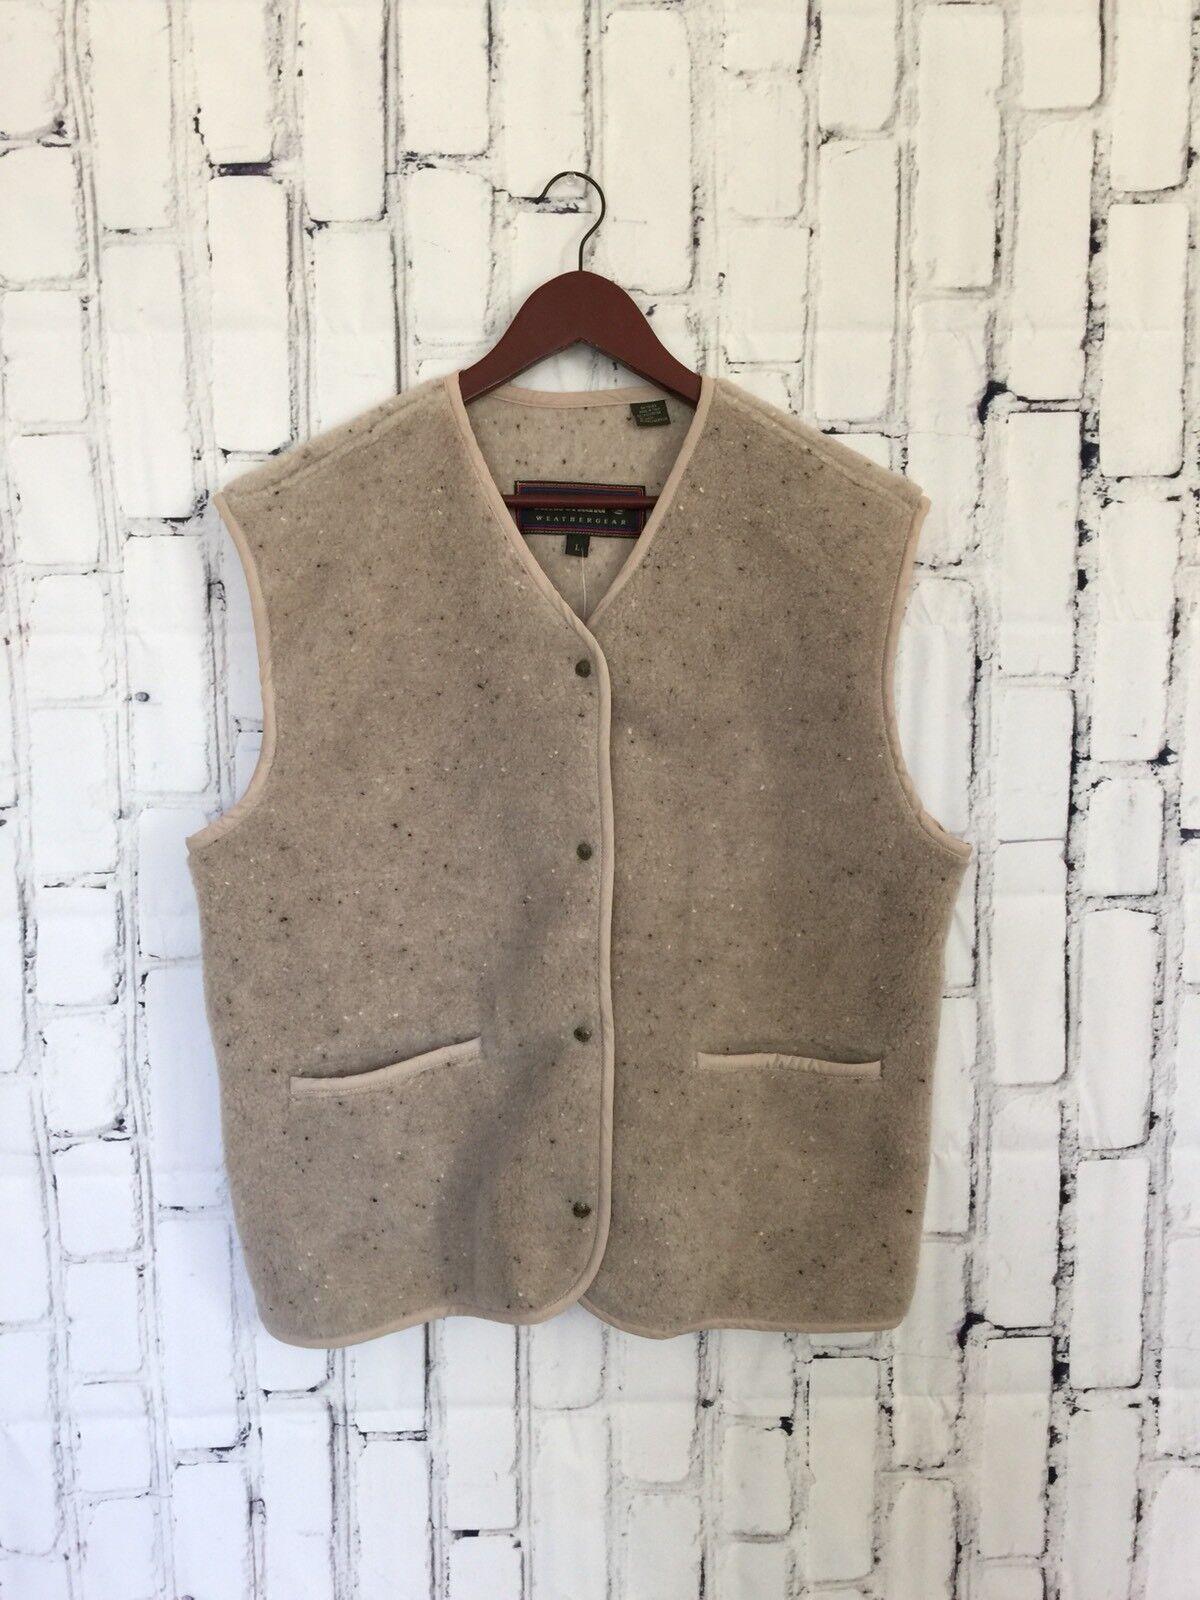 Timerland Weathergear Damenschuhe Vest Größe Large Oatmeal Wool Blend Made In